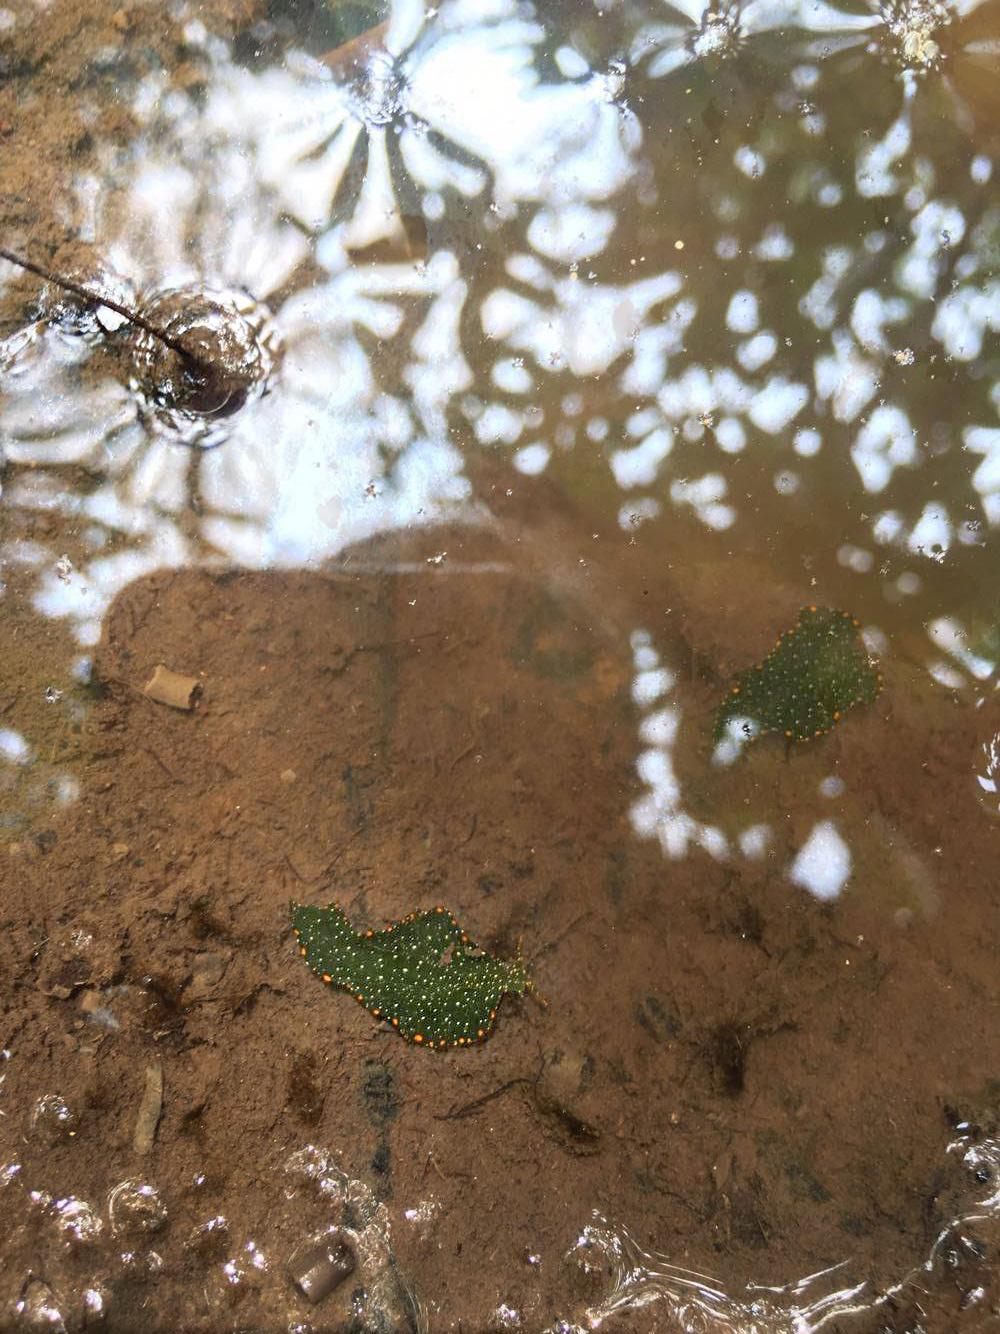 Mangrove Leaf Slug  Elysia bangtawaensis